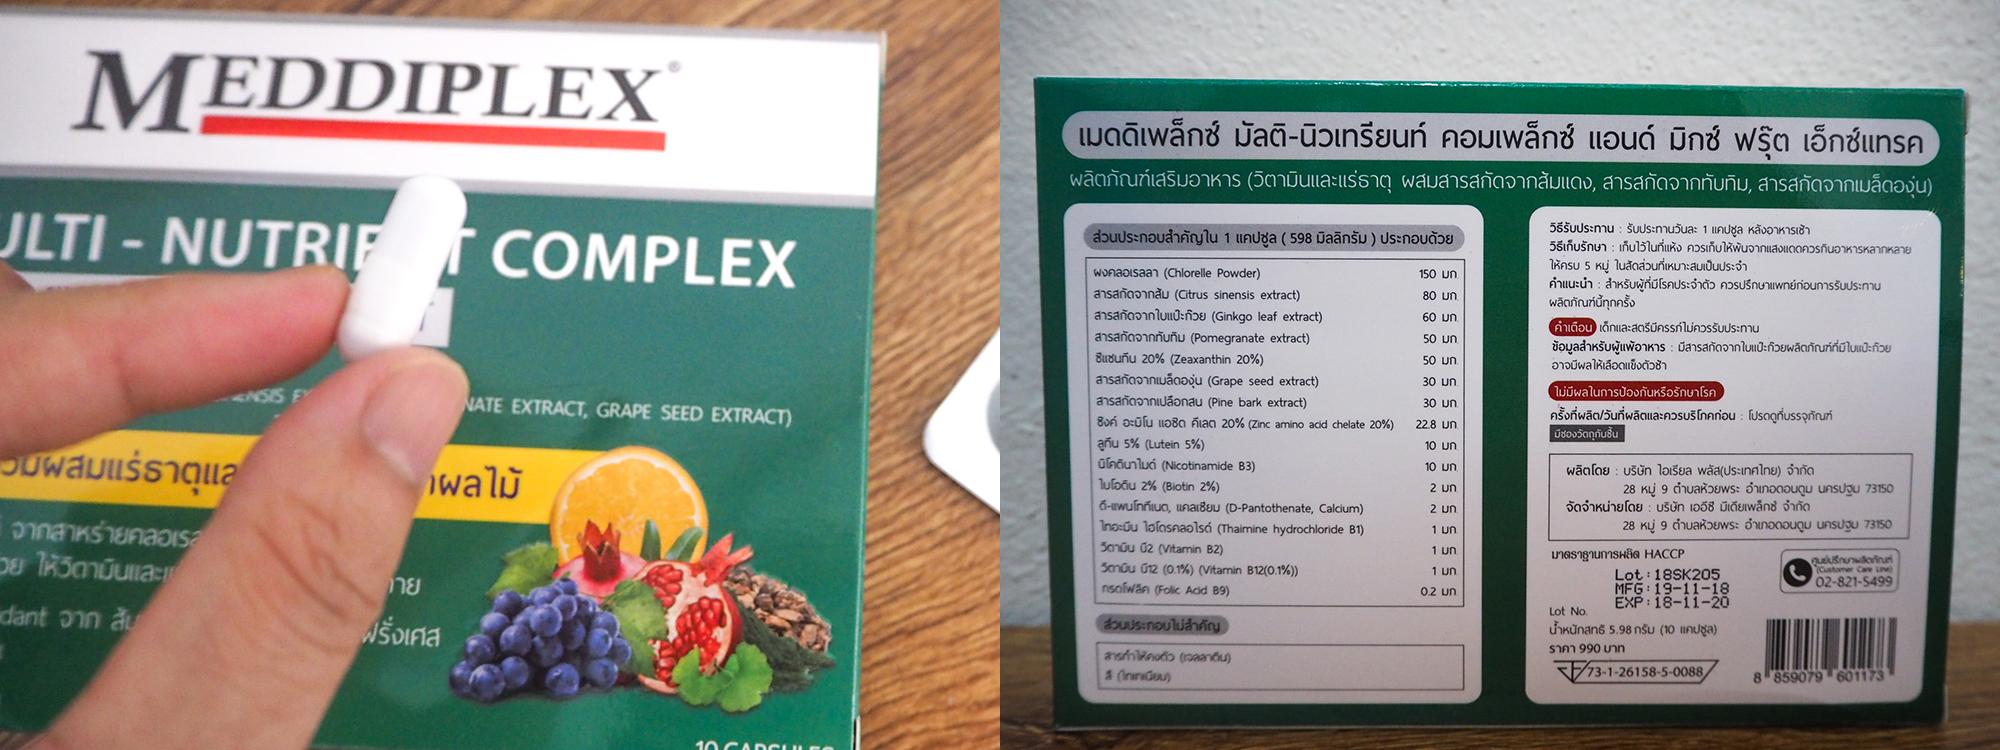 """Meddiplex"" ผลิตภัณฑ์อาหารเสริม"